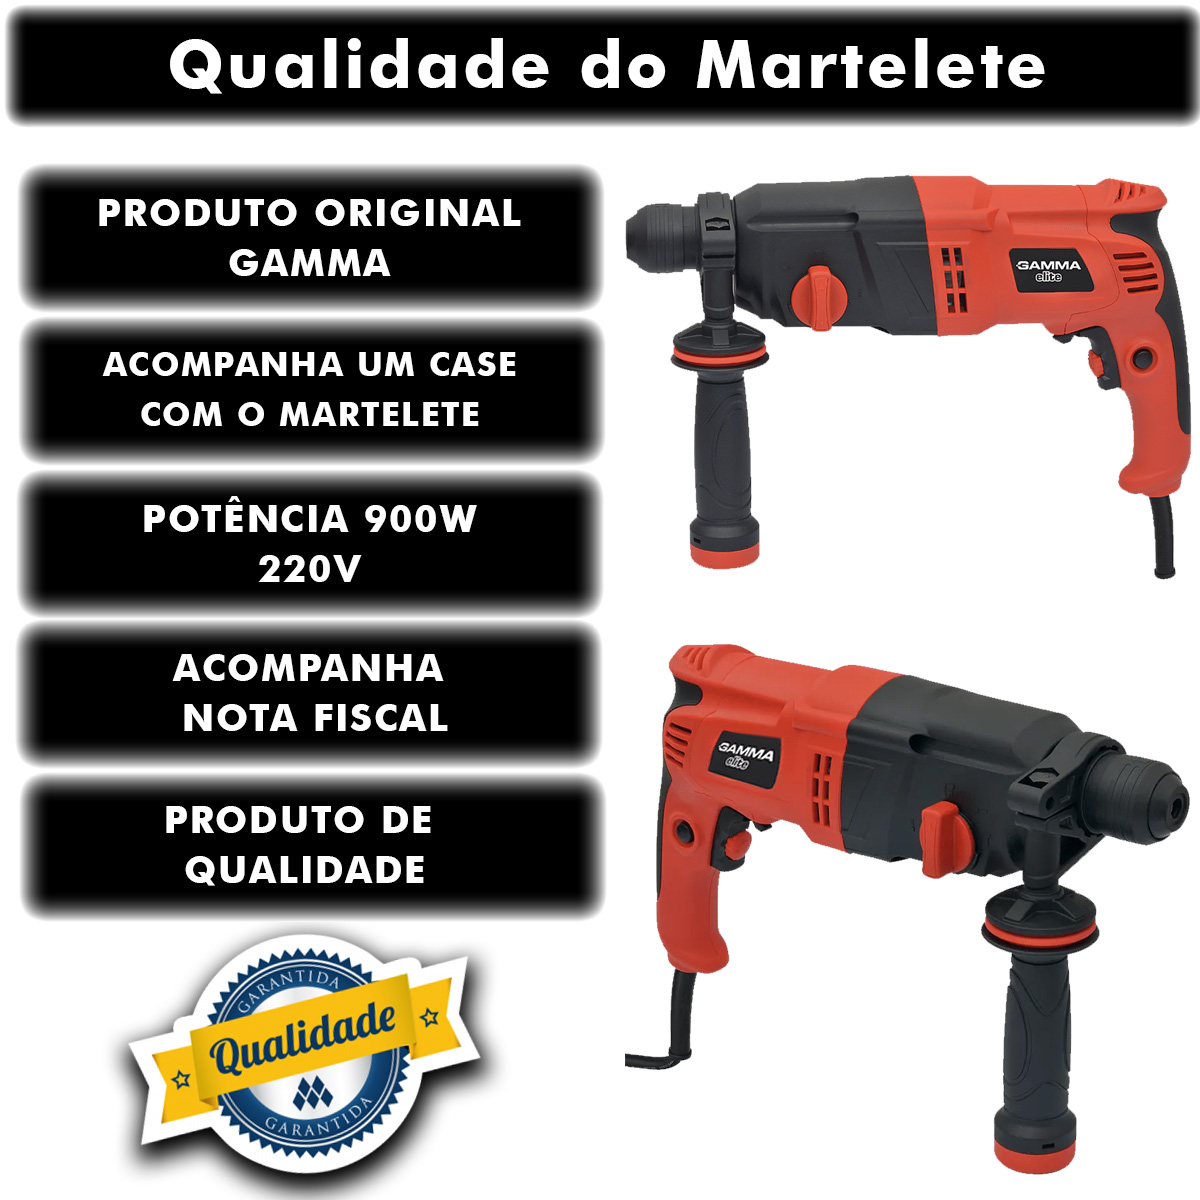 Martelete Gamma Elite 900w Perfurador Rotativo Rompedor 220v Poliparts